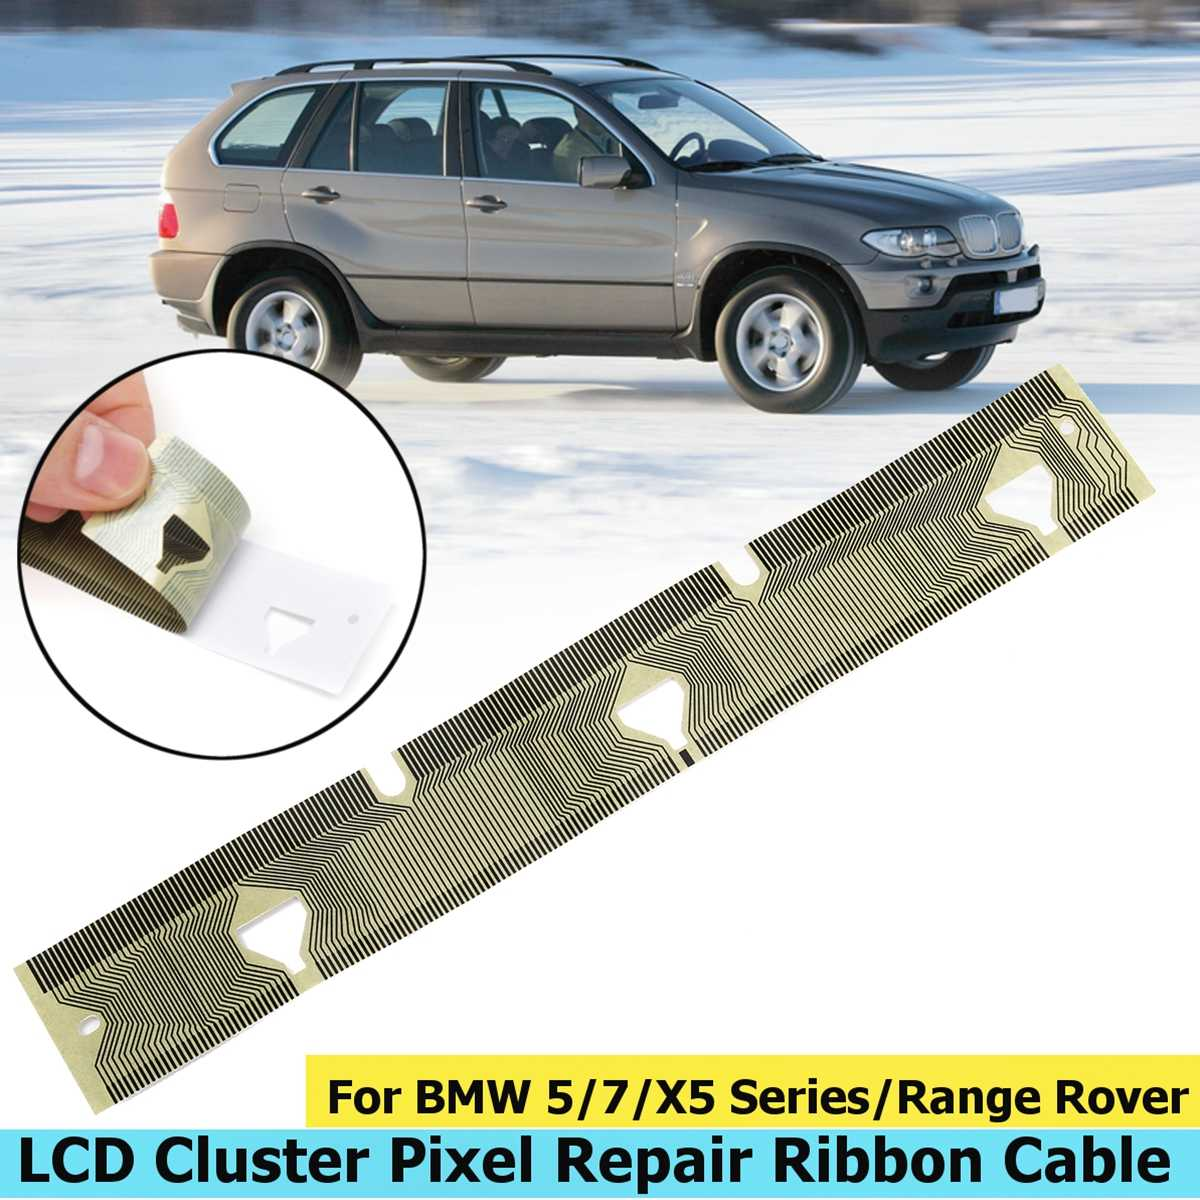 1 pc Dashboard Instrumentenpaneel Lcd Lint Kabel Voor BMW E38 Pixel Reparatie E39 E53 X5 Snelheidsmeter